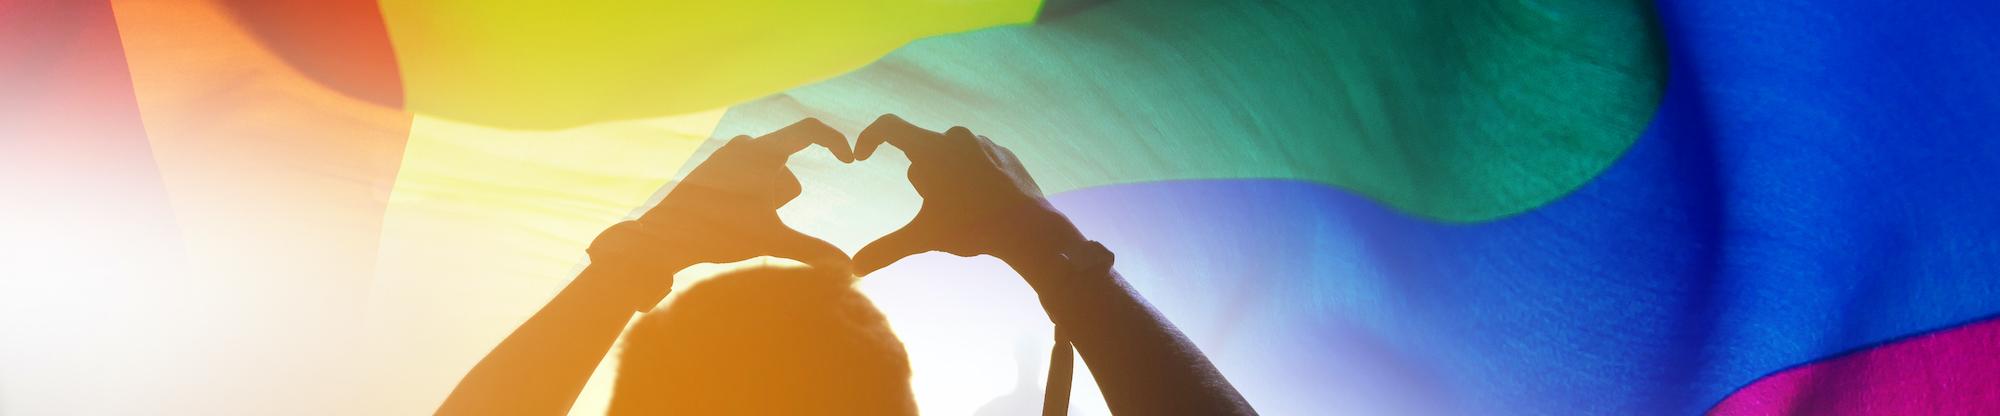 LGBTQ Pride Resource Group at Citrix